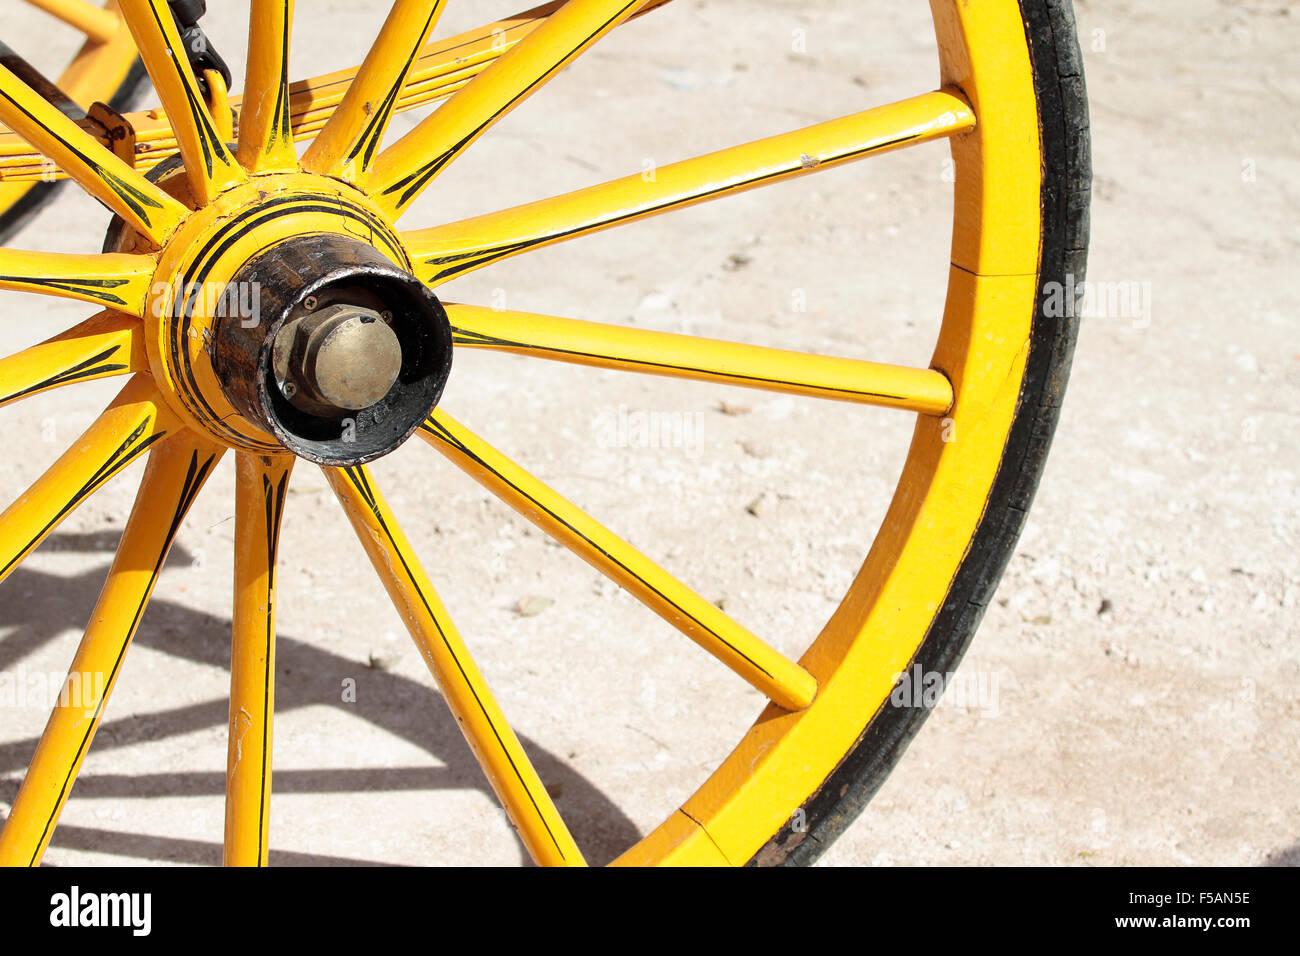 Wagon Wheel Shape Stock Photos & Wagon Wheel Shape Stock Images - Alamy